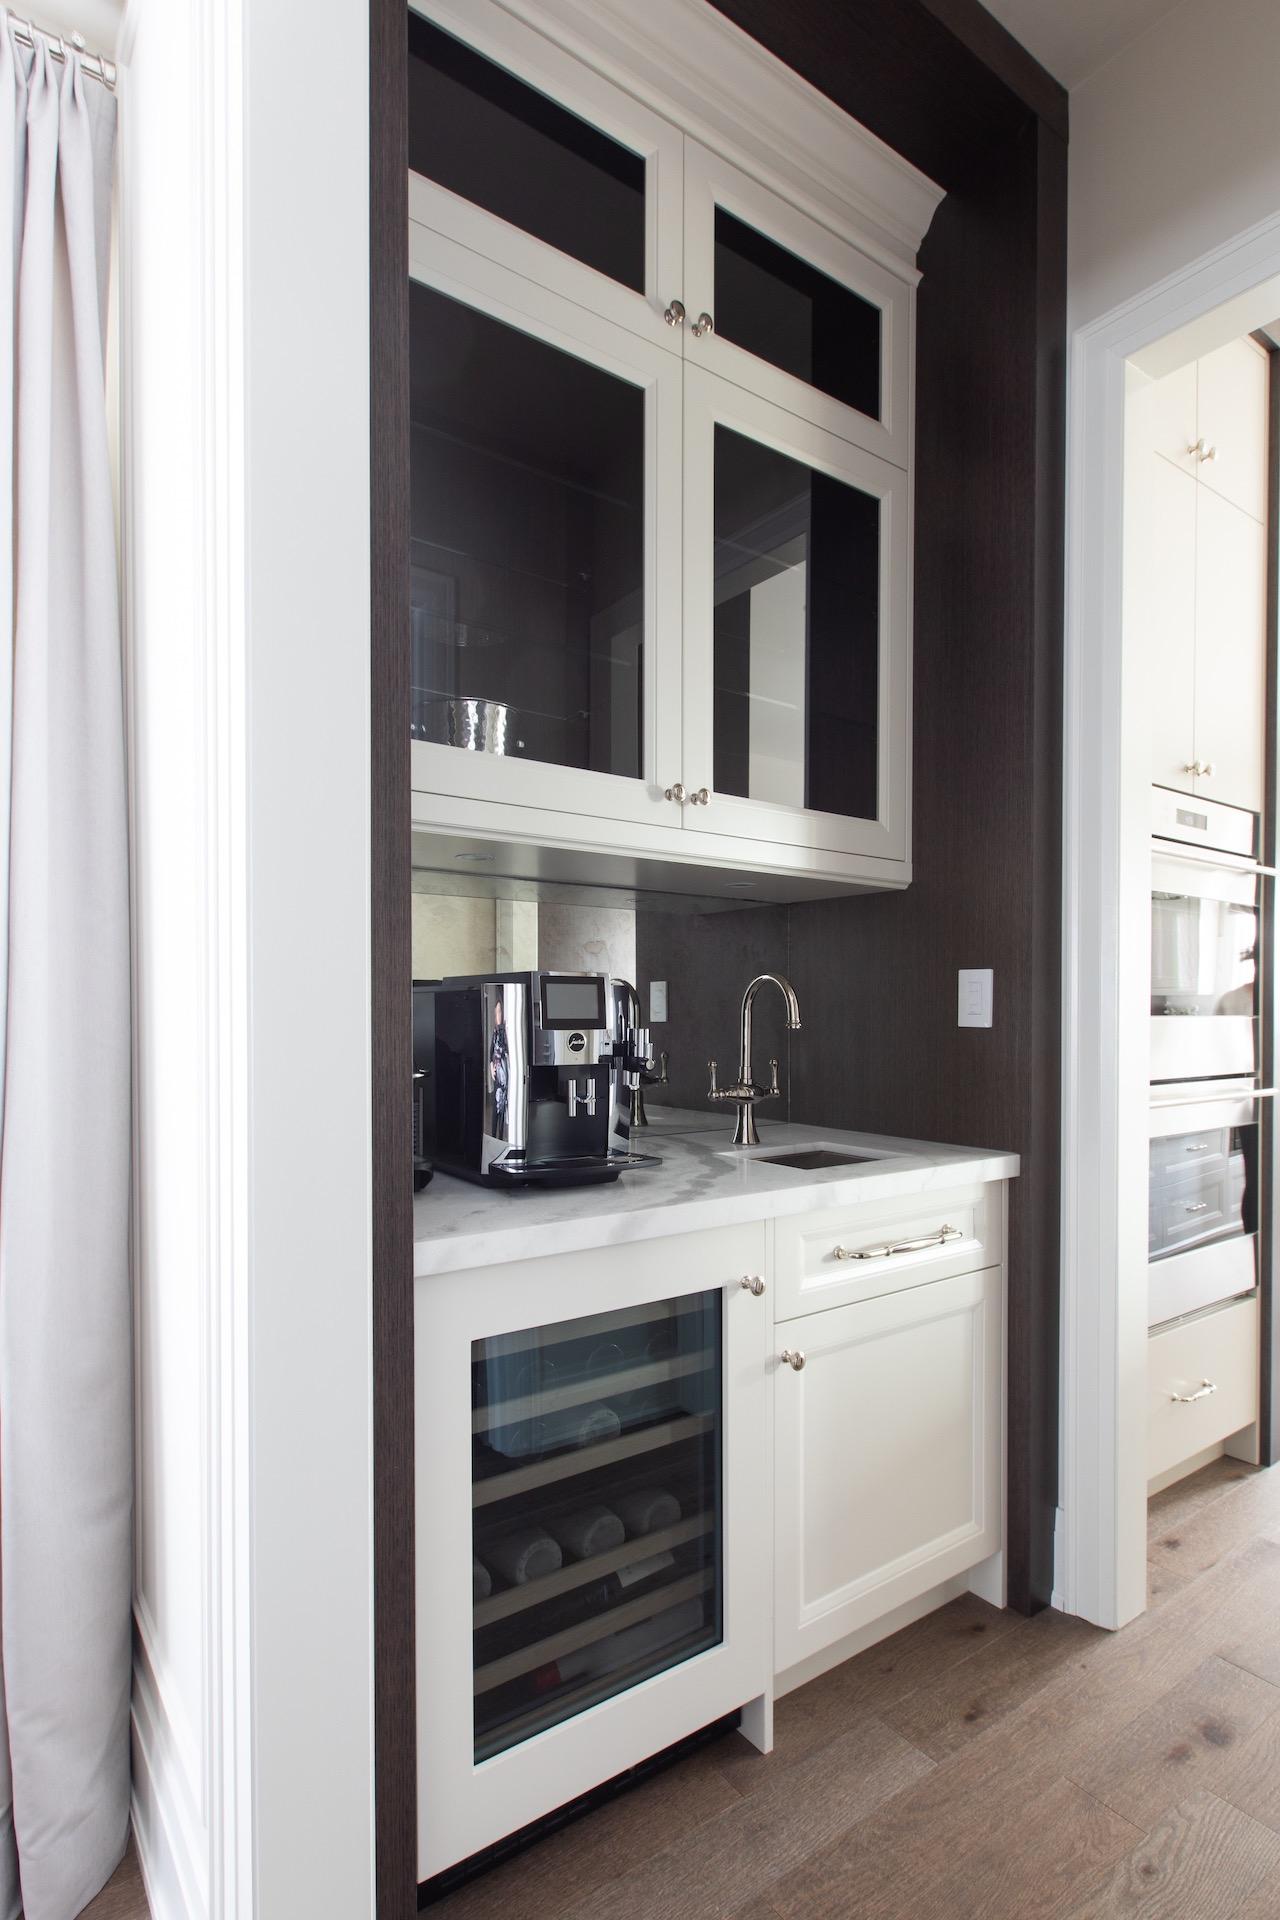 side kitchen bar with mini fridge